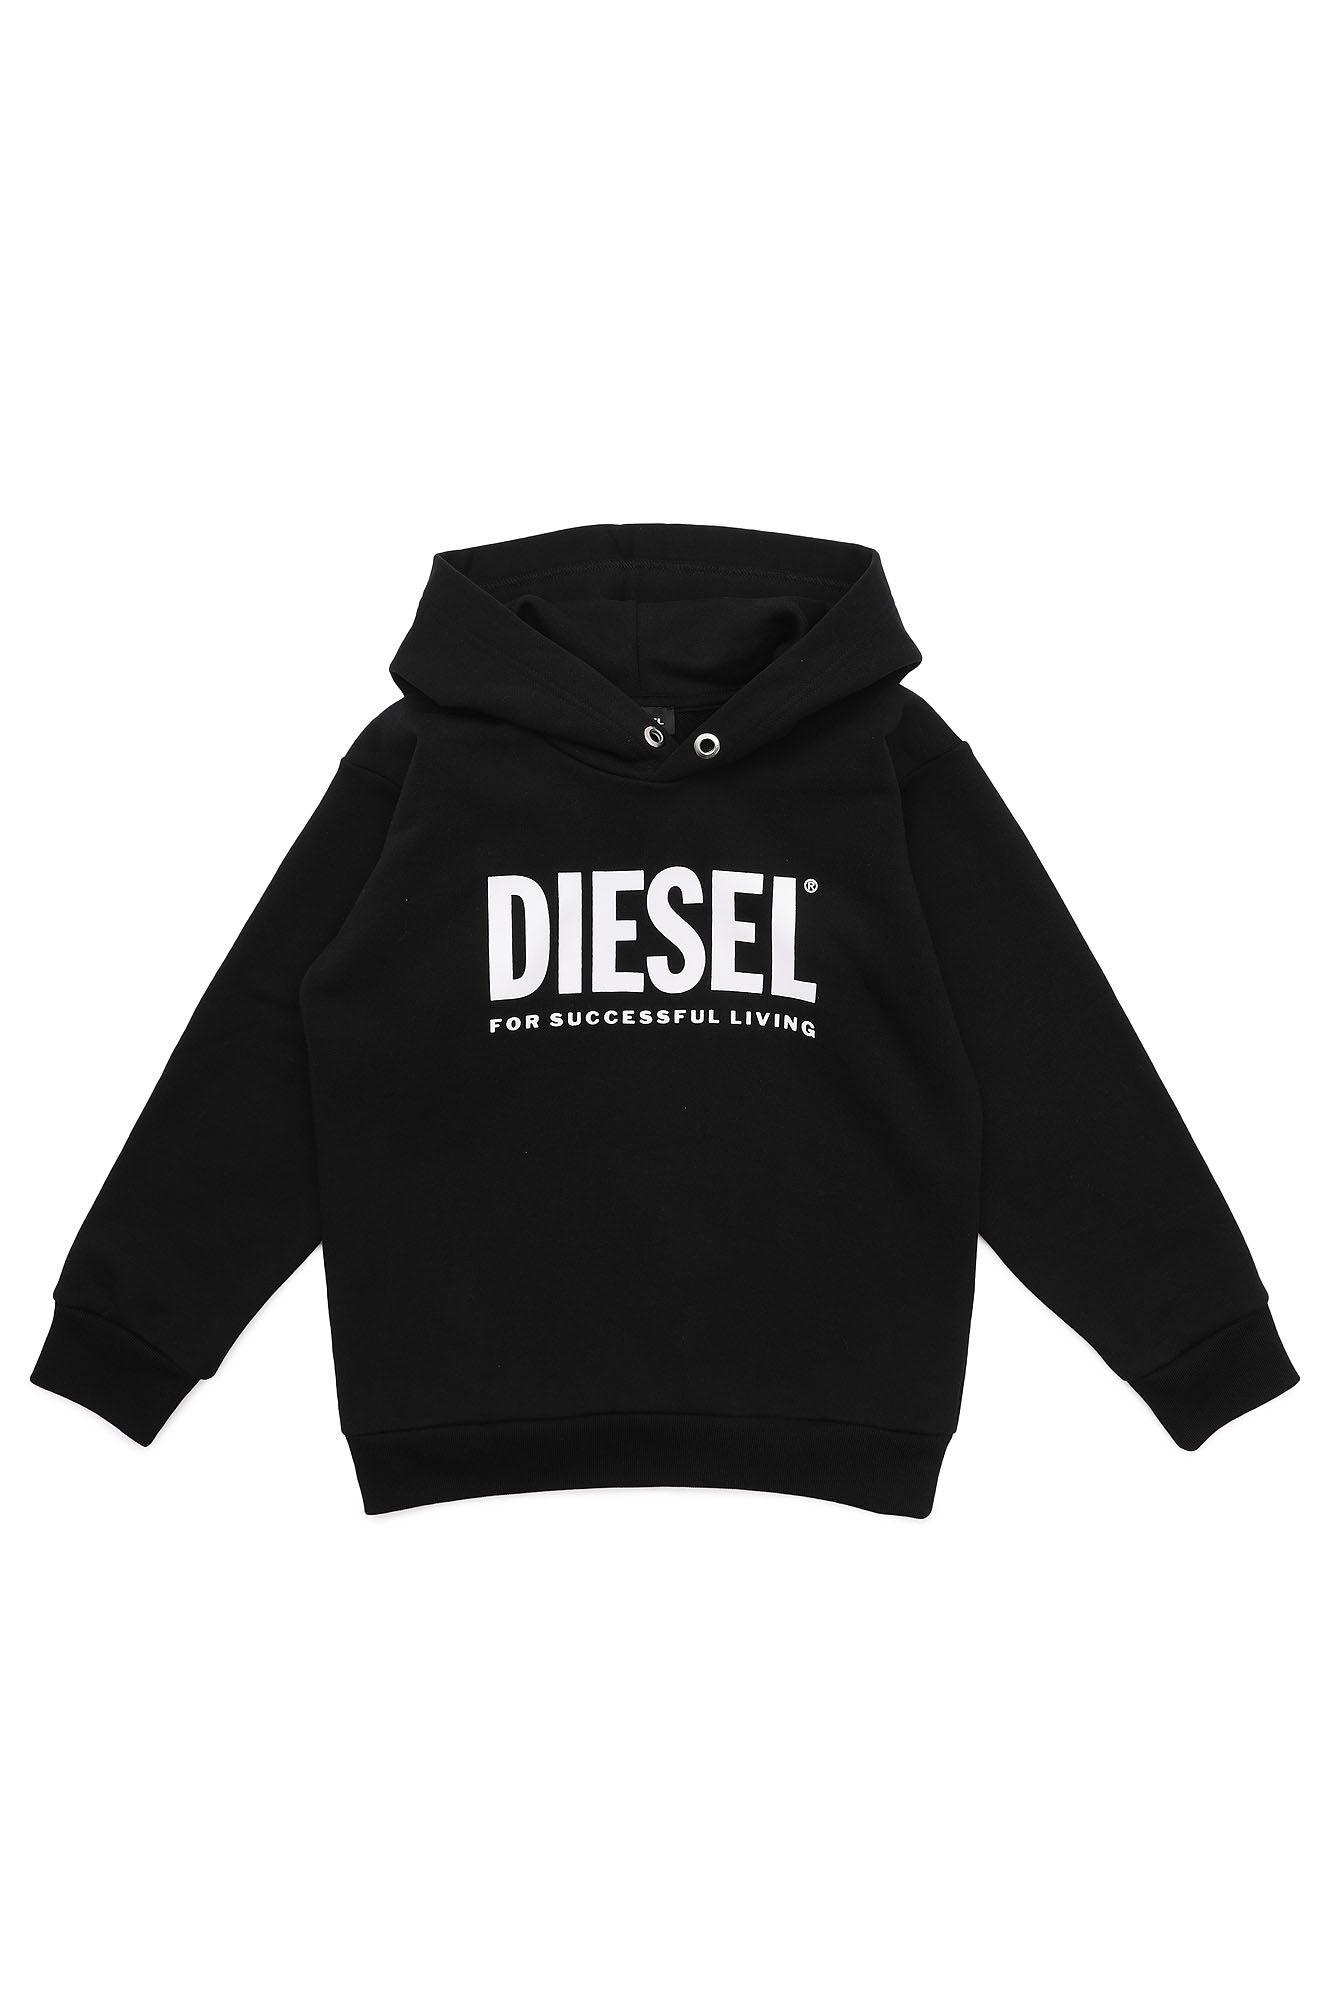 Sdivision-Logo Over Sweatshirt - Diesel Kid